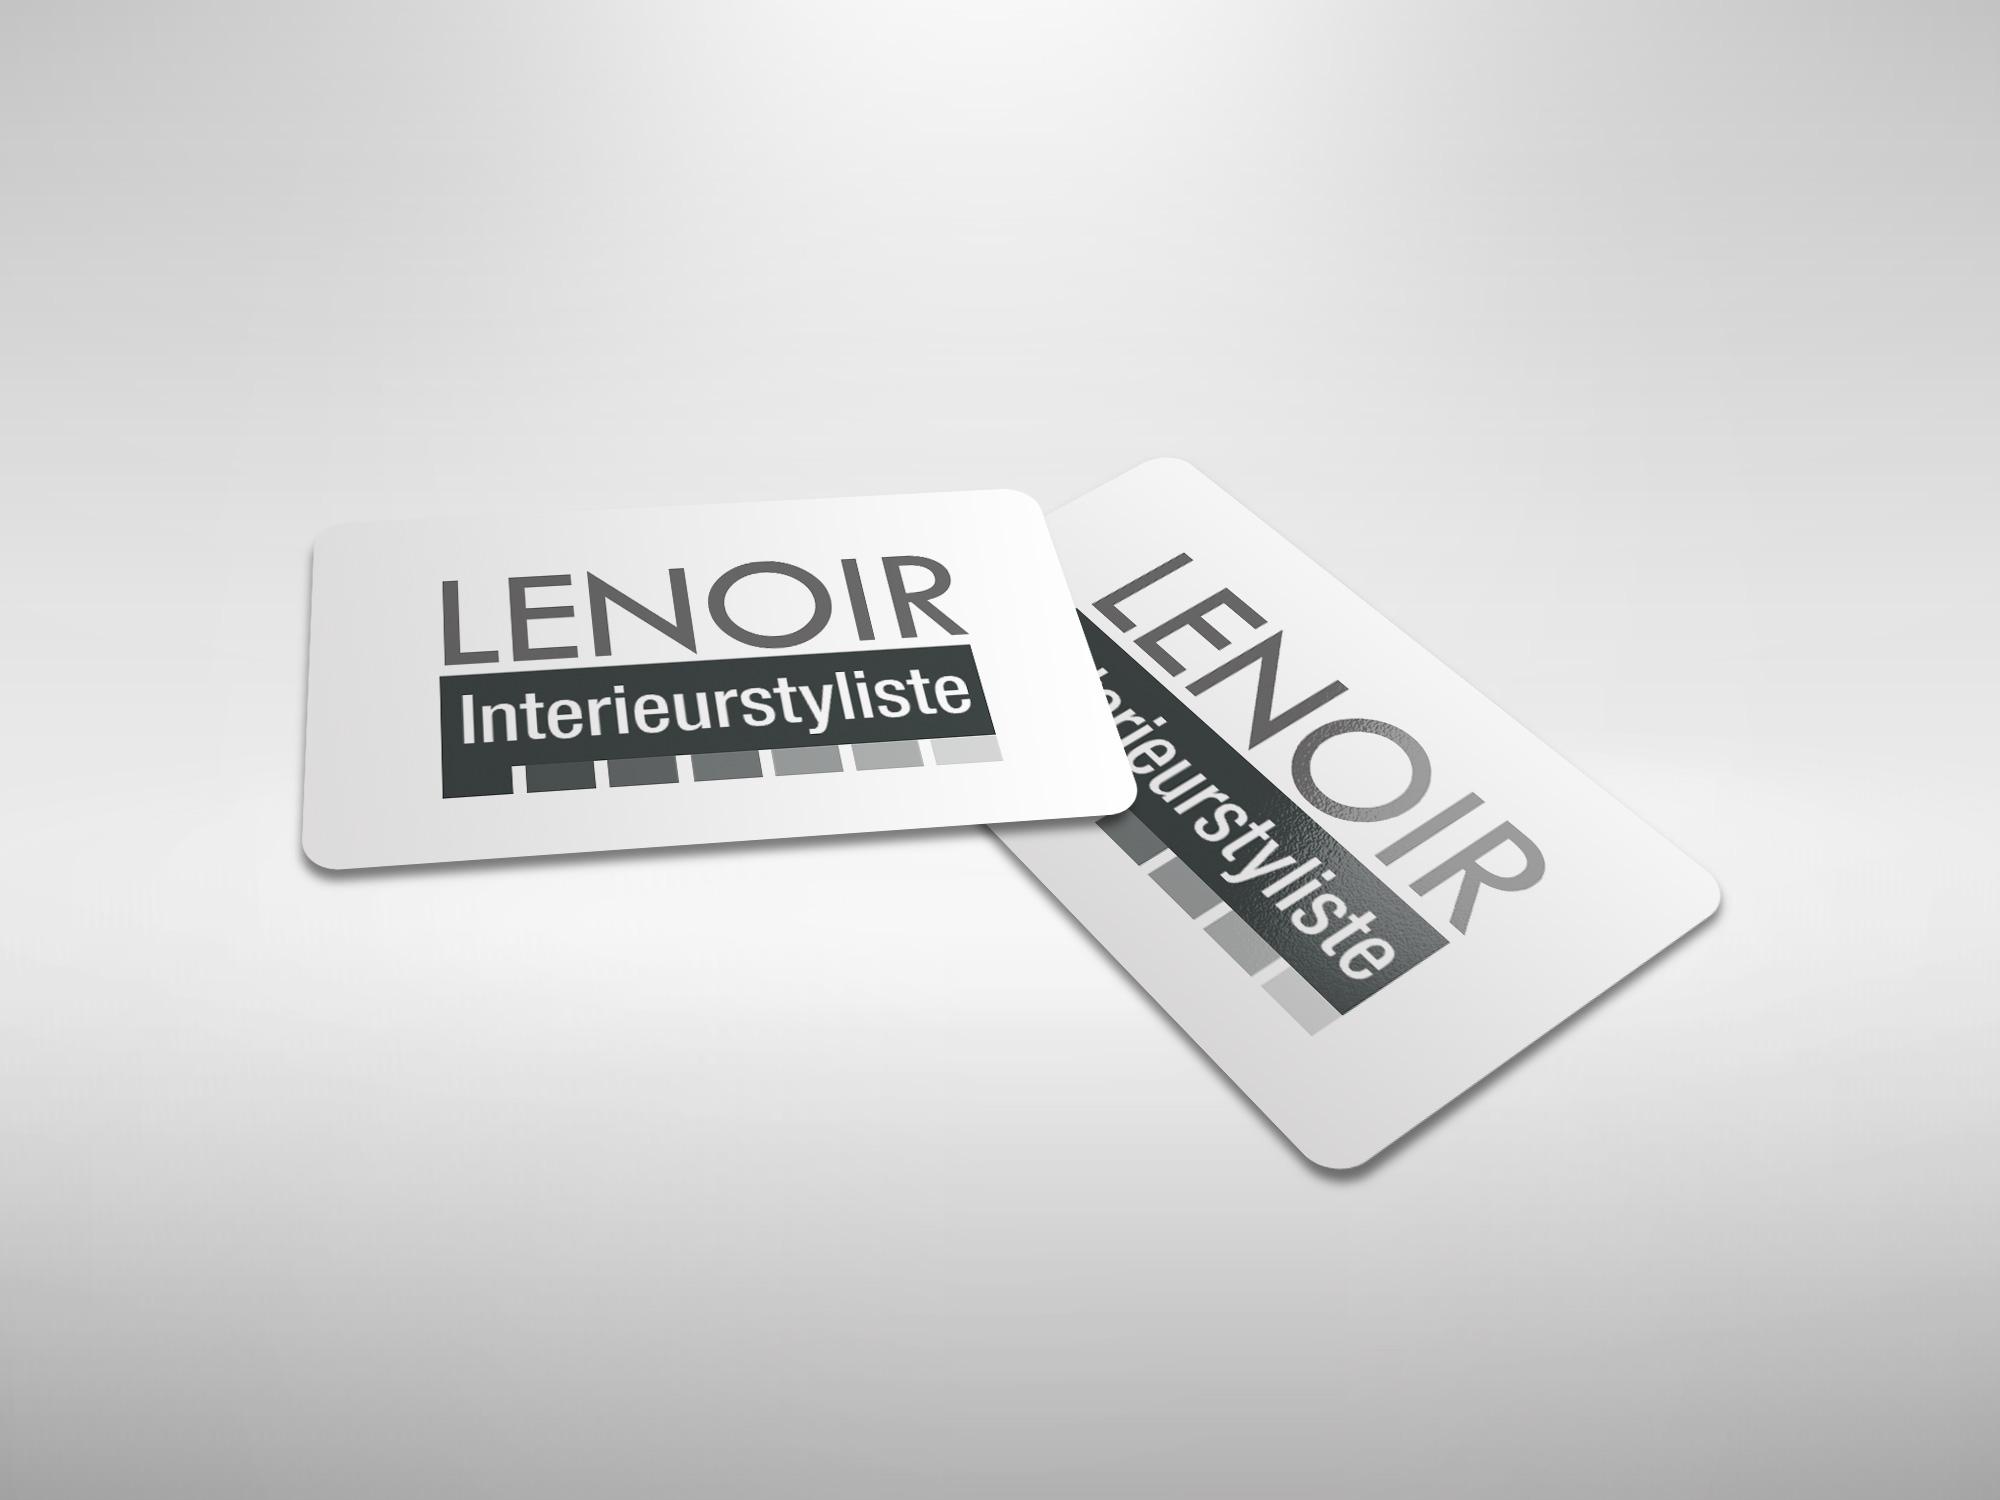 Lenoir - Interieur Dizadesign